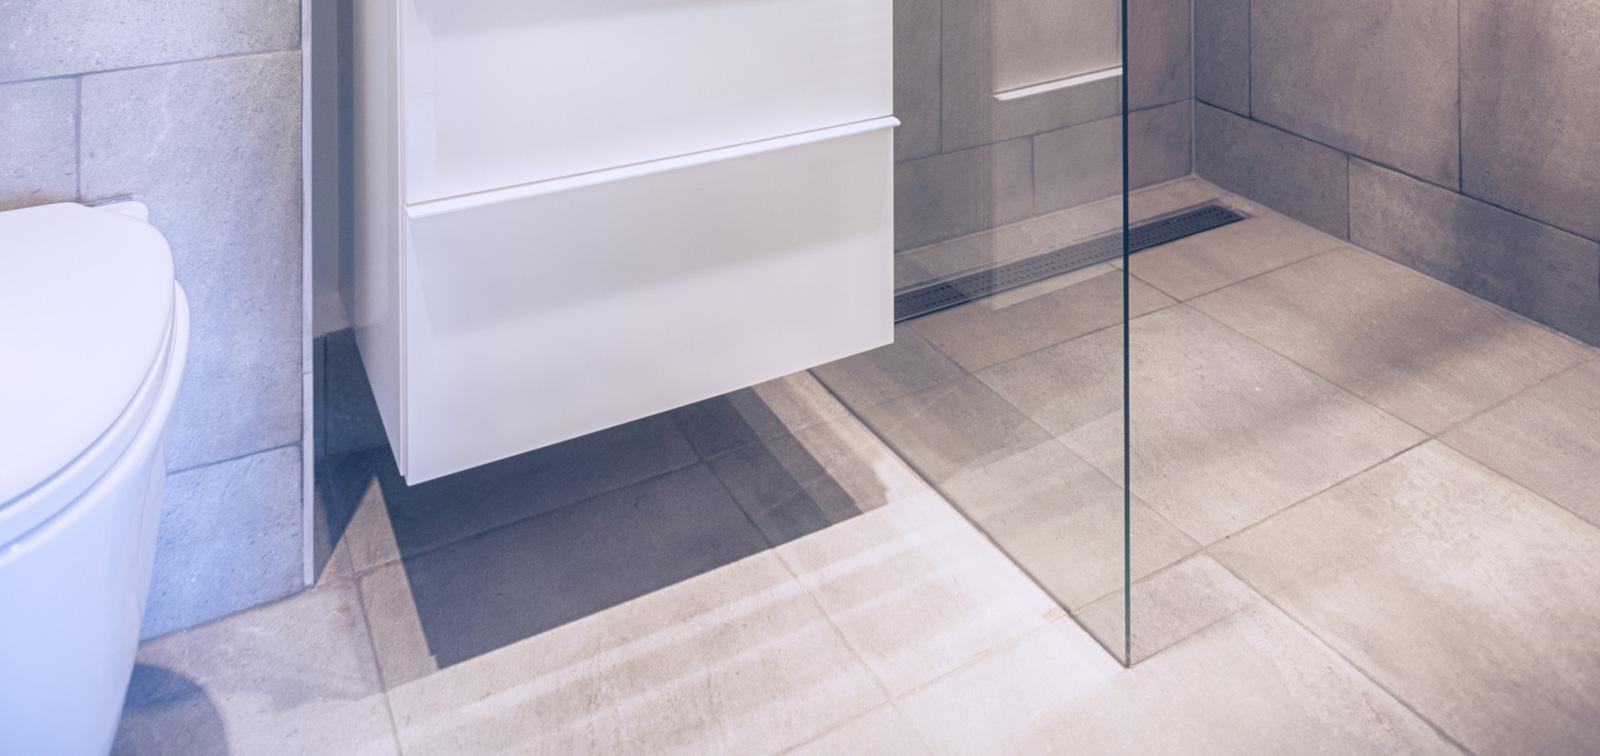 Photo starlight floor tiles images photo starlight floor tiles photo starlight floor tiles images quartz wall dailygadgetfo Gallery